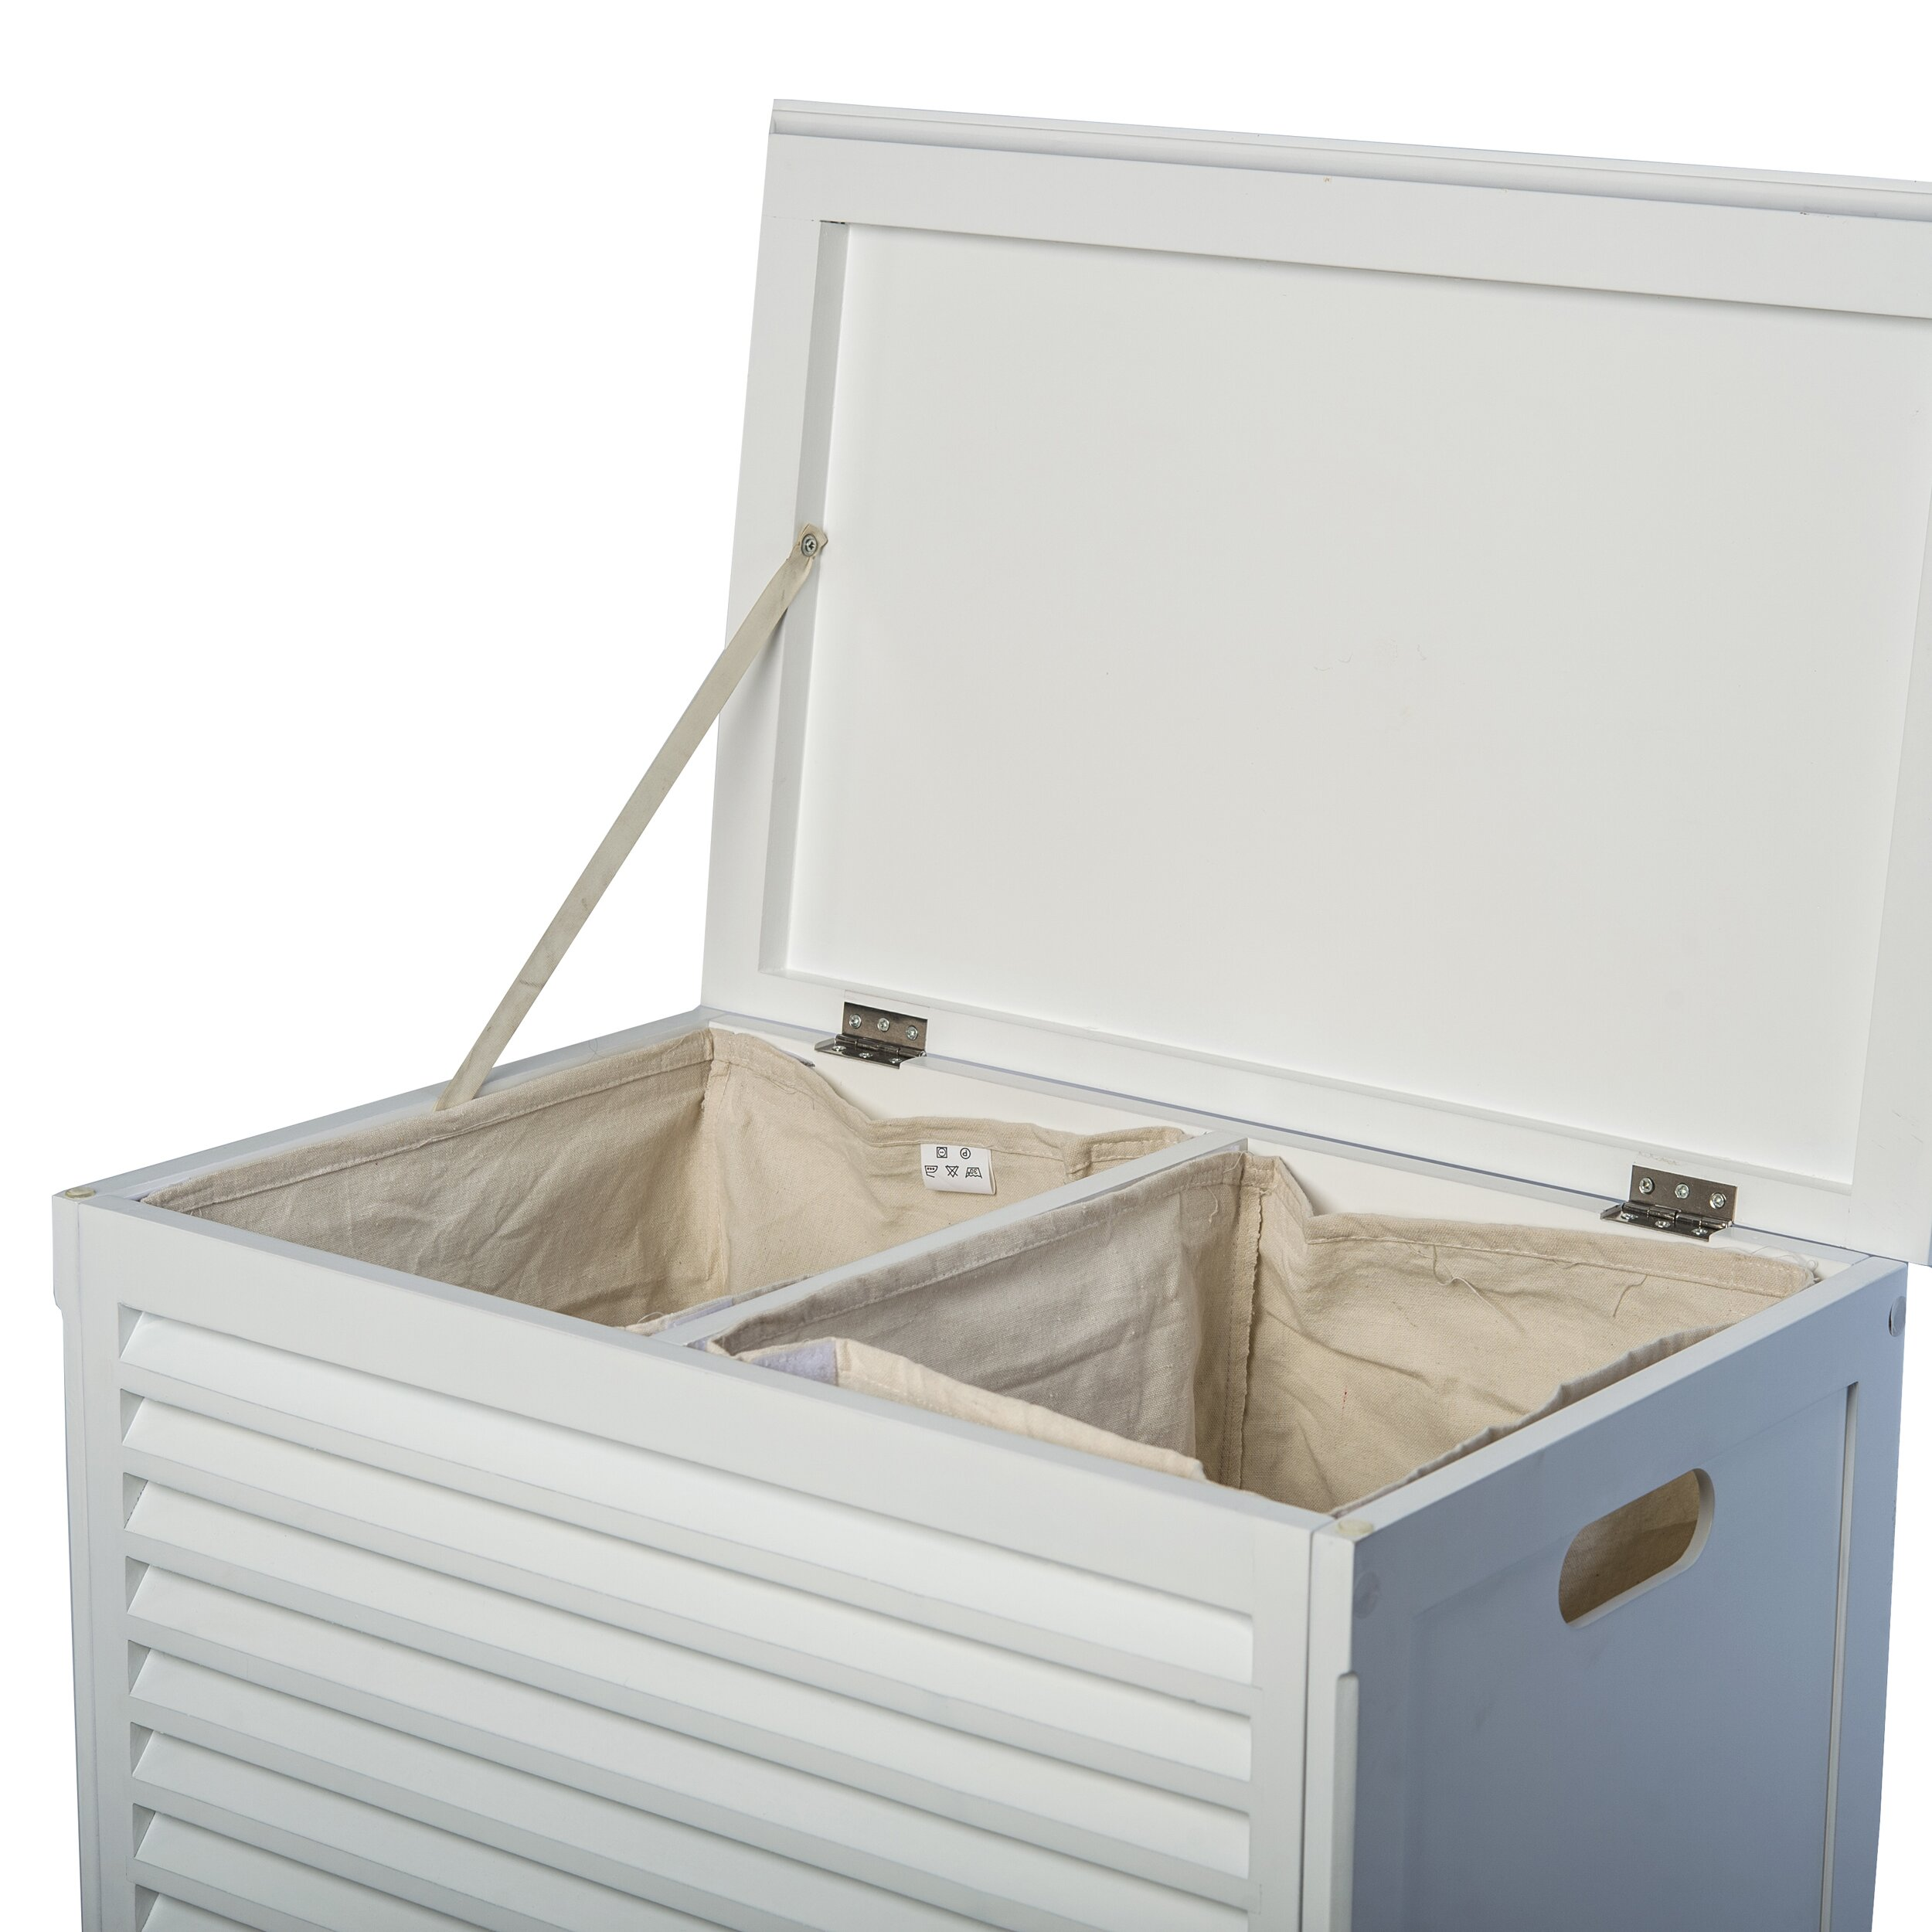 Elegant Home Fashions Salem Laundry Sorter. Elegant Home Fashions Salem Laundry Sorter   Reviews   Wayfair